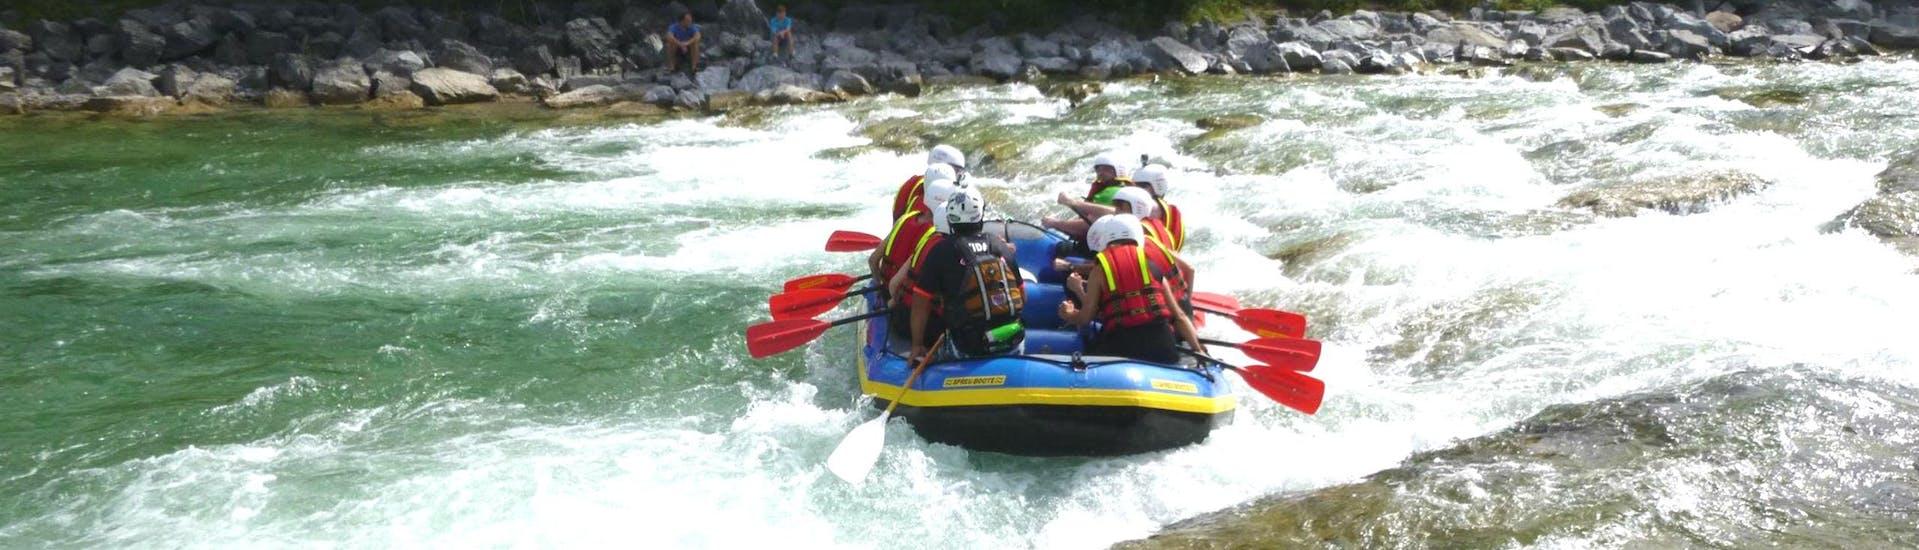 rafting-on-the-isar-for-beginners-outdoor-dahoam-hero